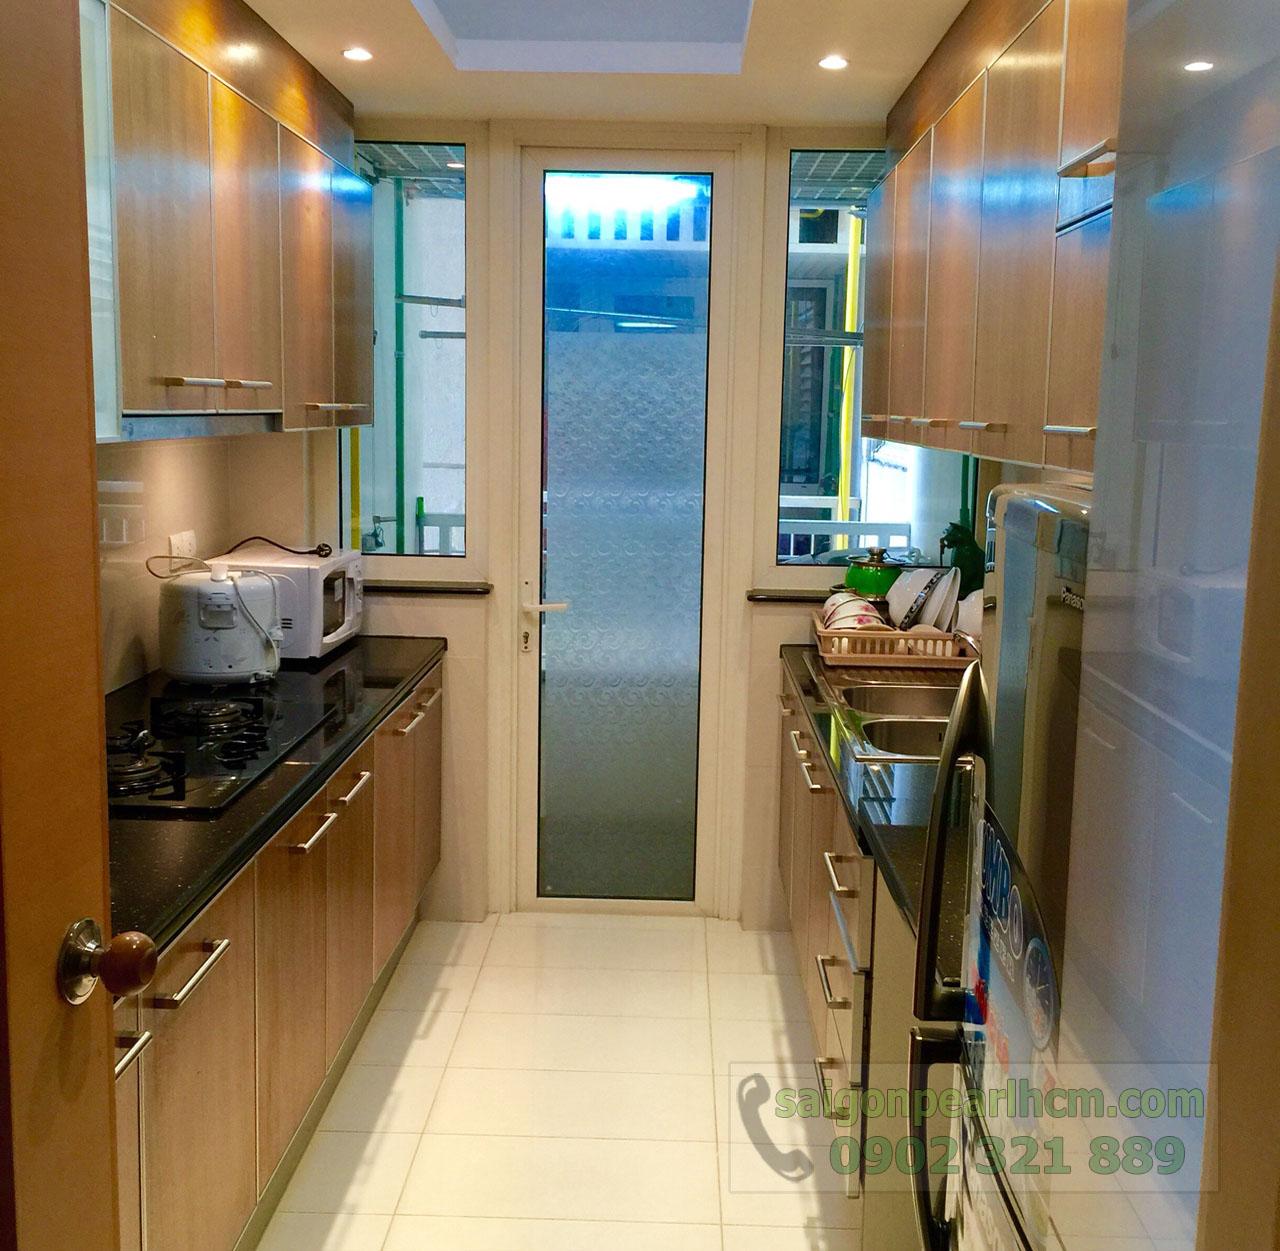 Cho thuê căn hộ Sapphire 2 Saigon Pearl